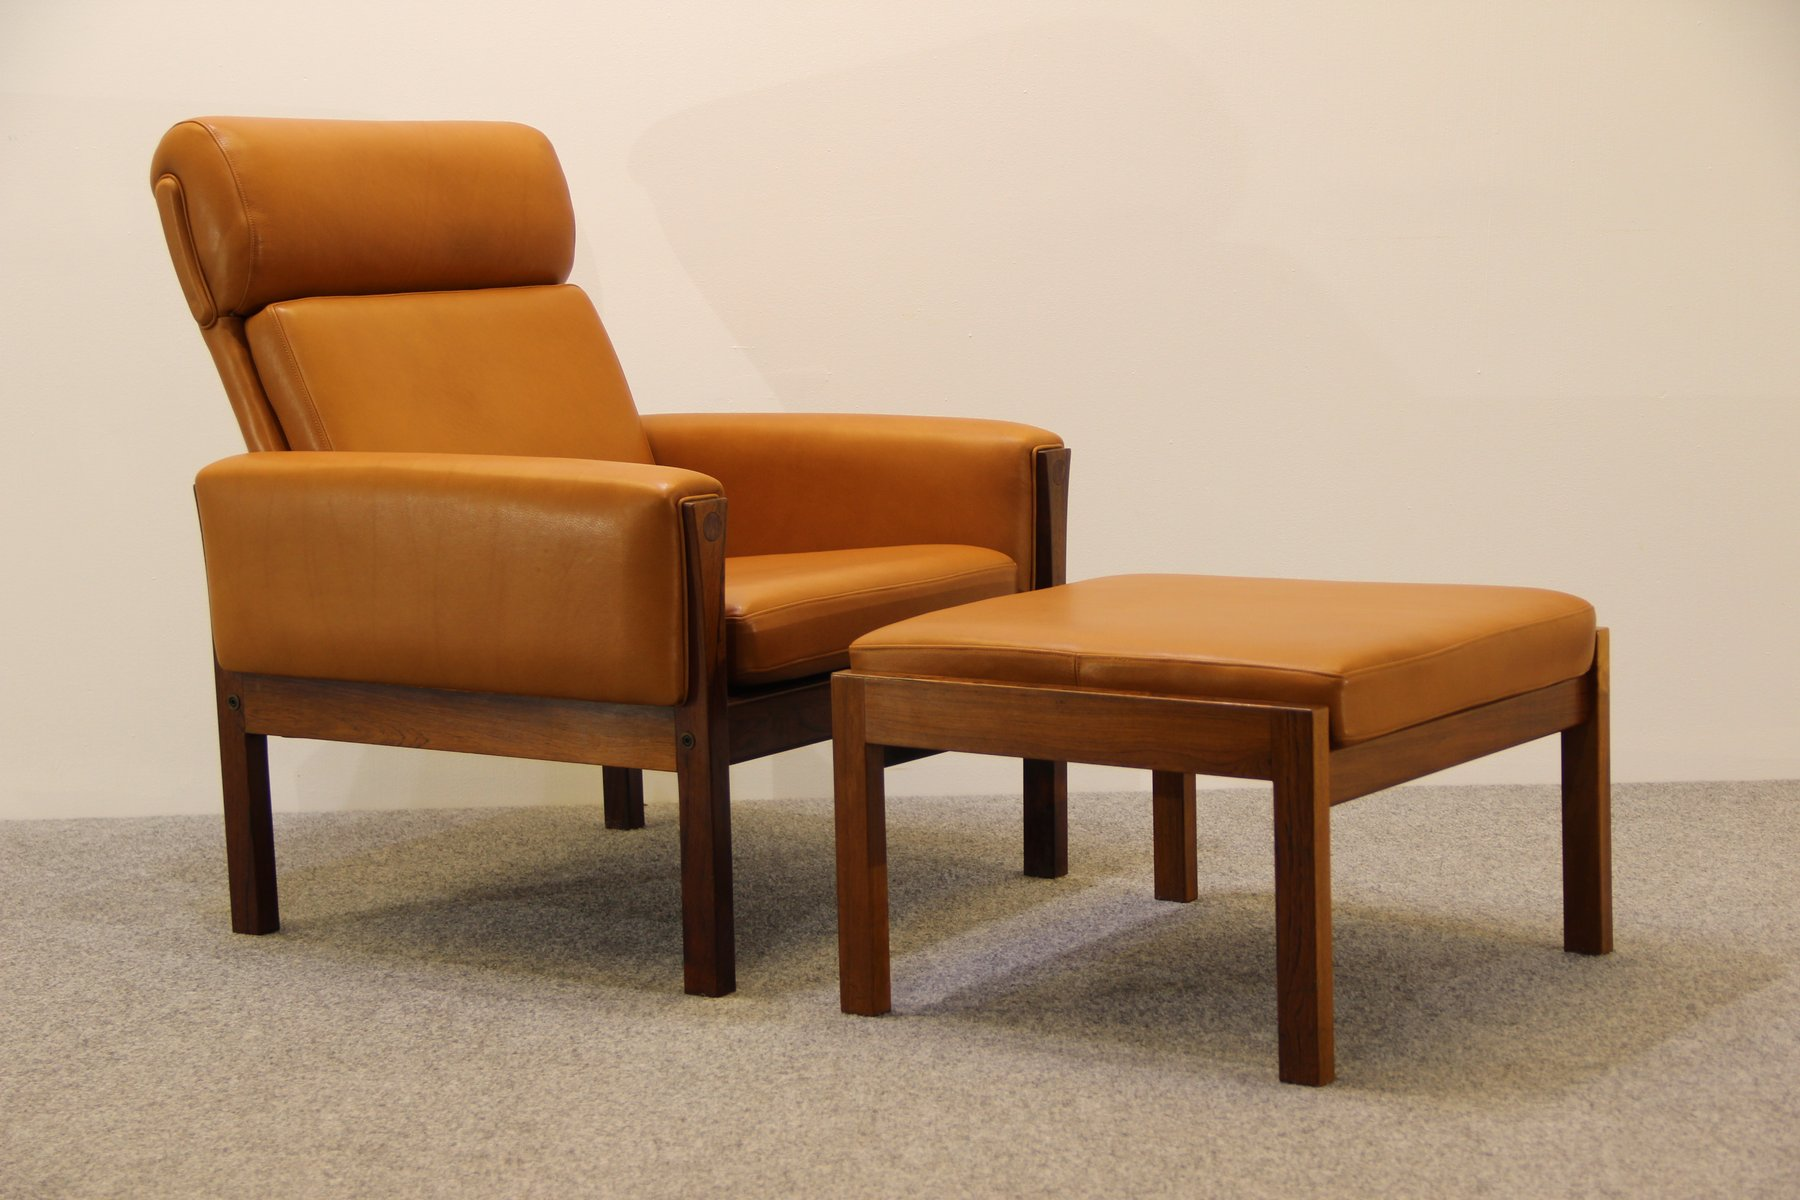 mid century ap62 sessel ottoman von hans j wegner f r. Black Bedroom Furniture Sets. Home Design Ideas